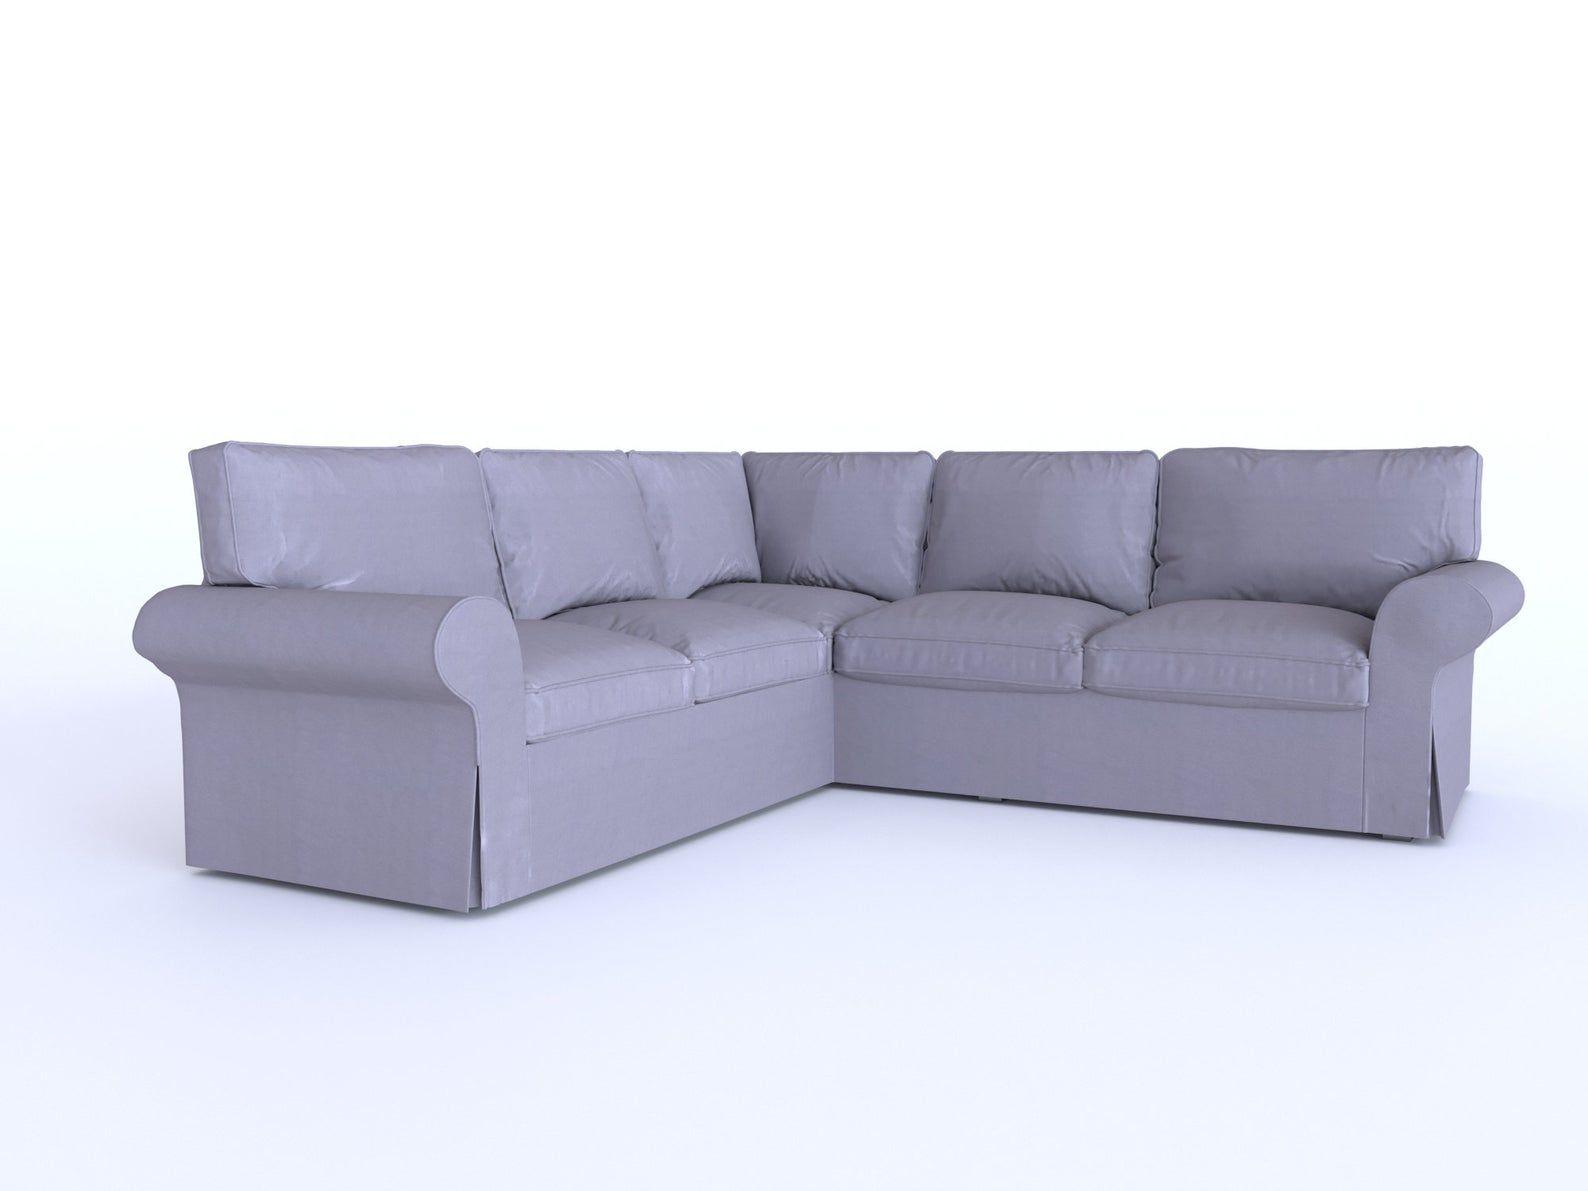 Whole Set Ektorp Corner Sofa Cover Heavy Duty Cotton Replace Etsy In 2020 Corner Sofa Covers Sofa Covers 4 Seat Corner Sofa